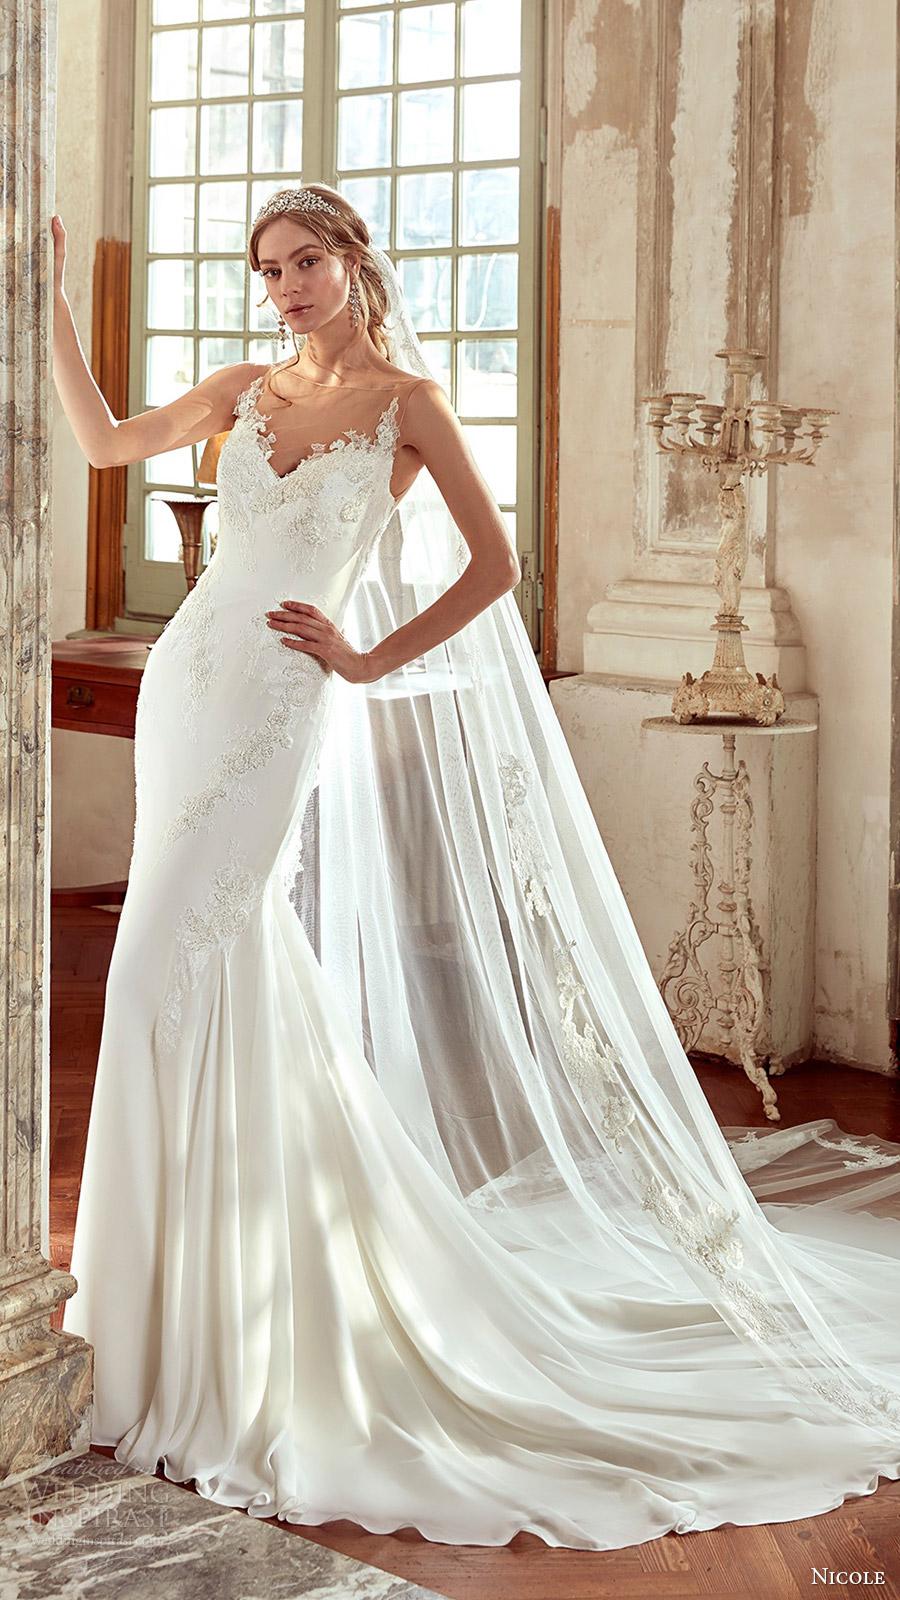 Nicole 2017 wedding dresses wedding inspirasi for Trisha yearwood wedding dress